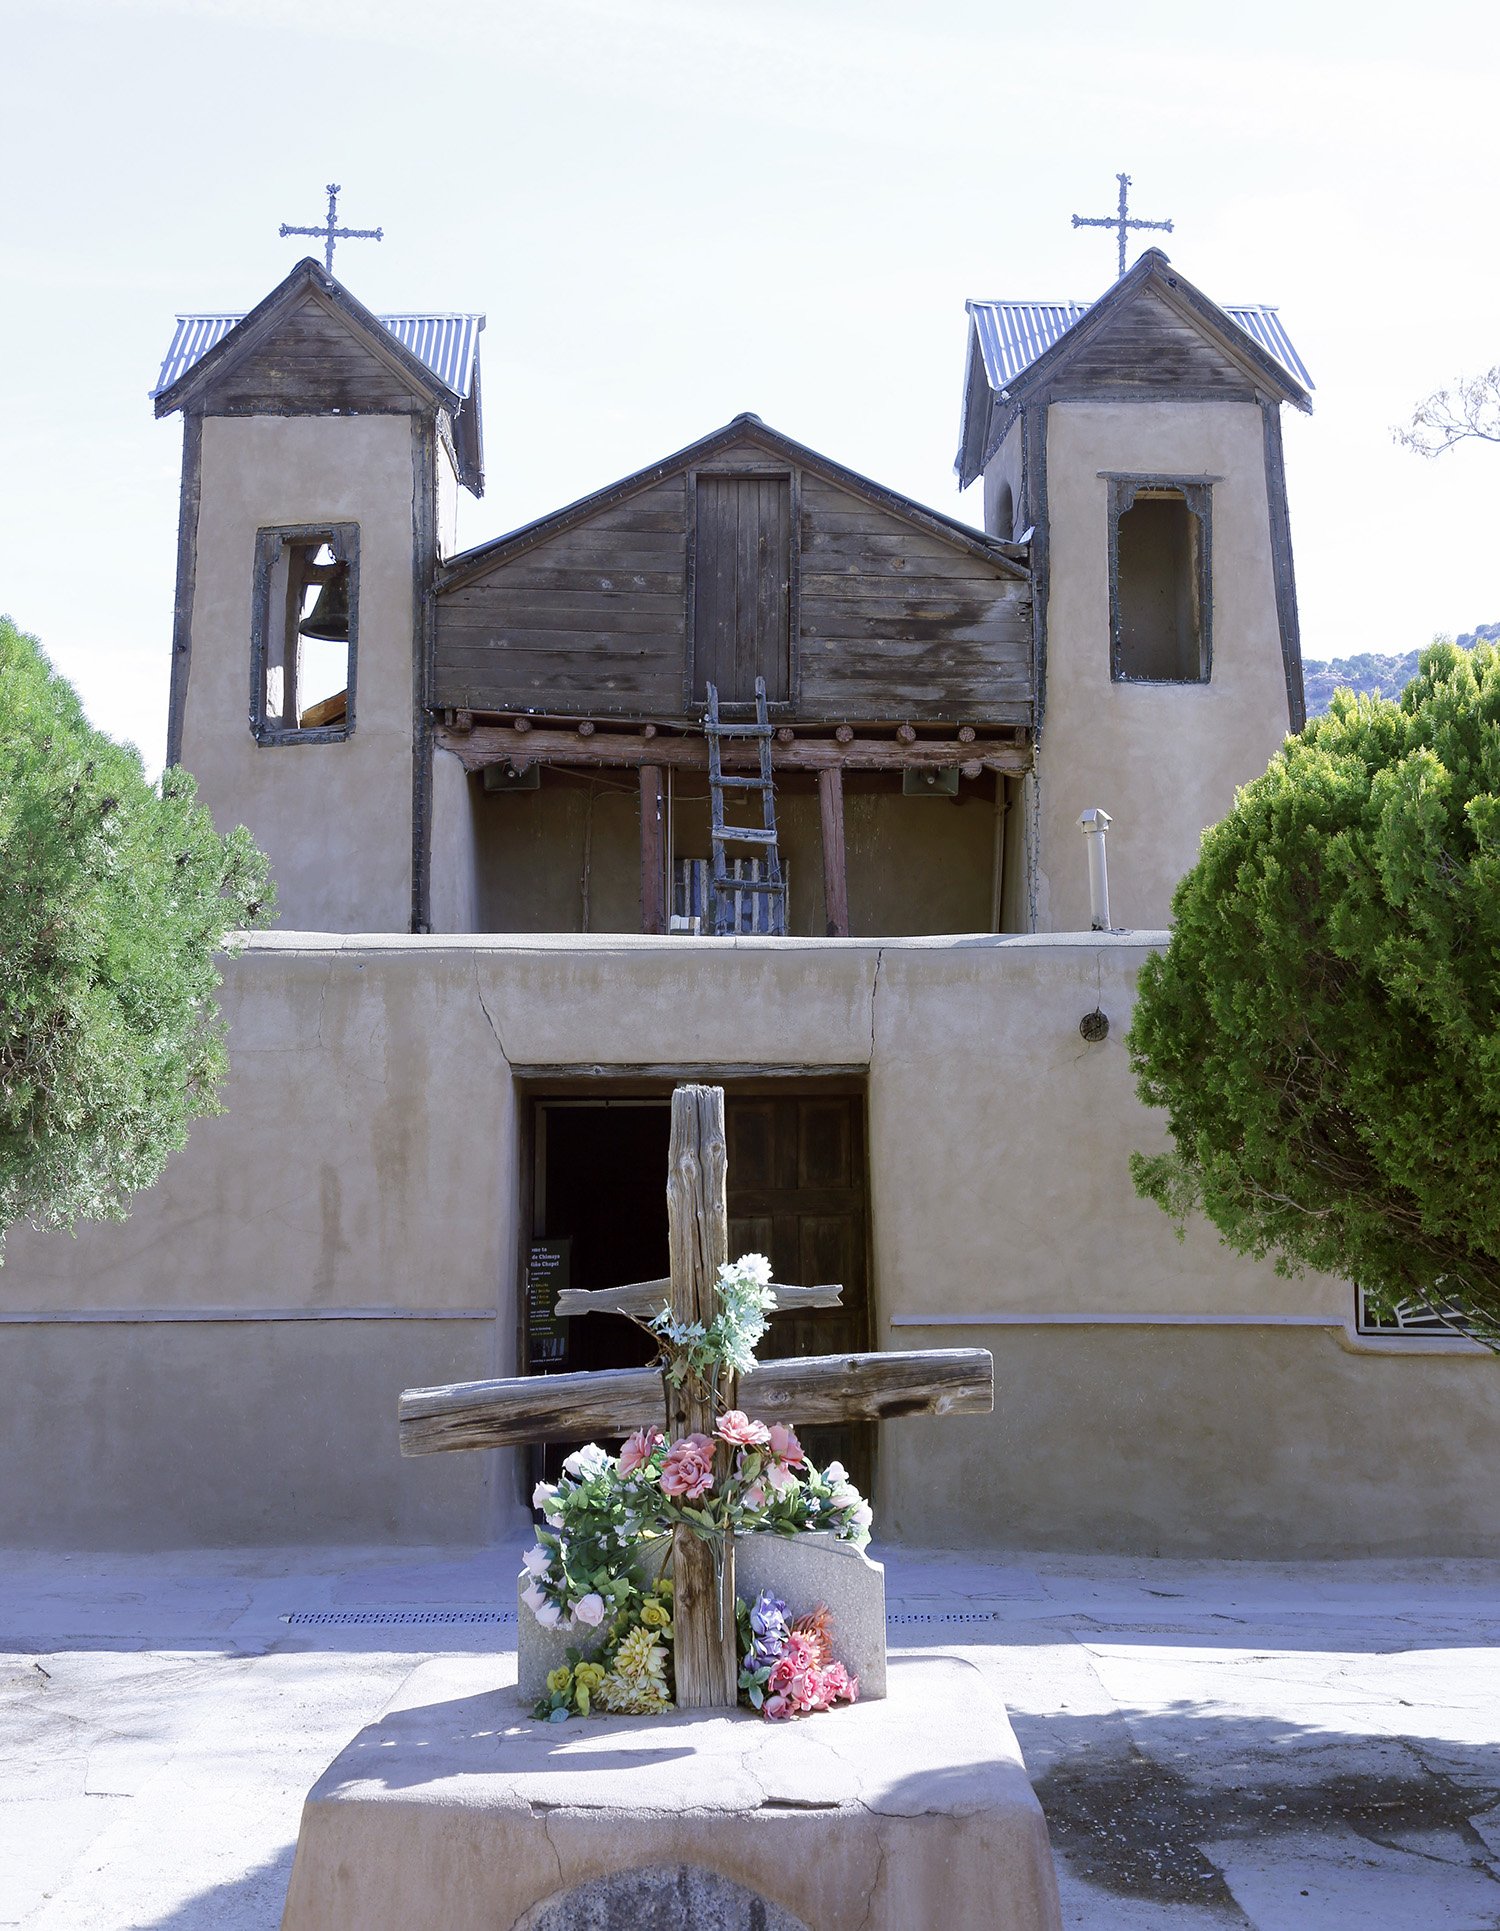 The Shrine at Chimayo